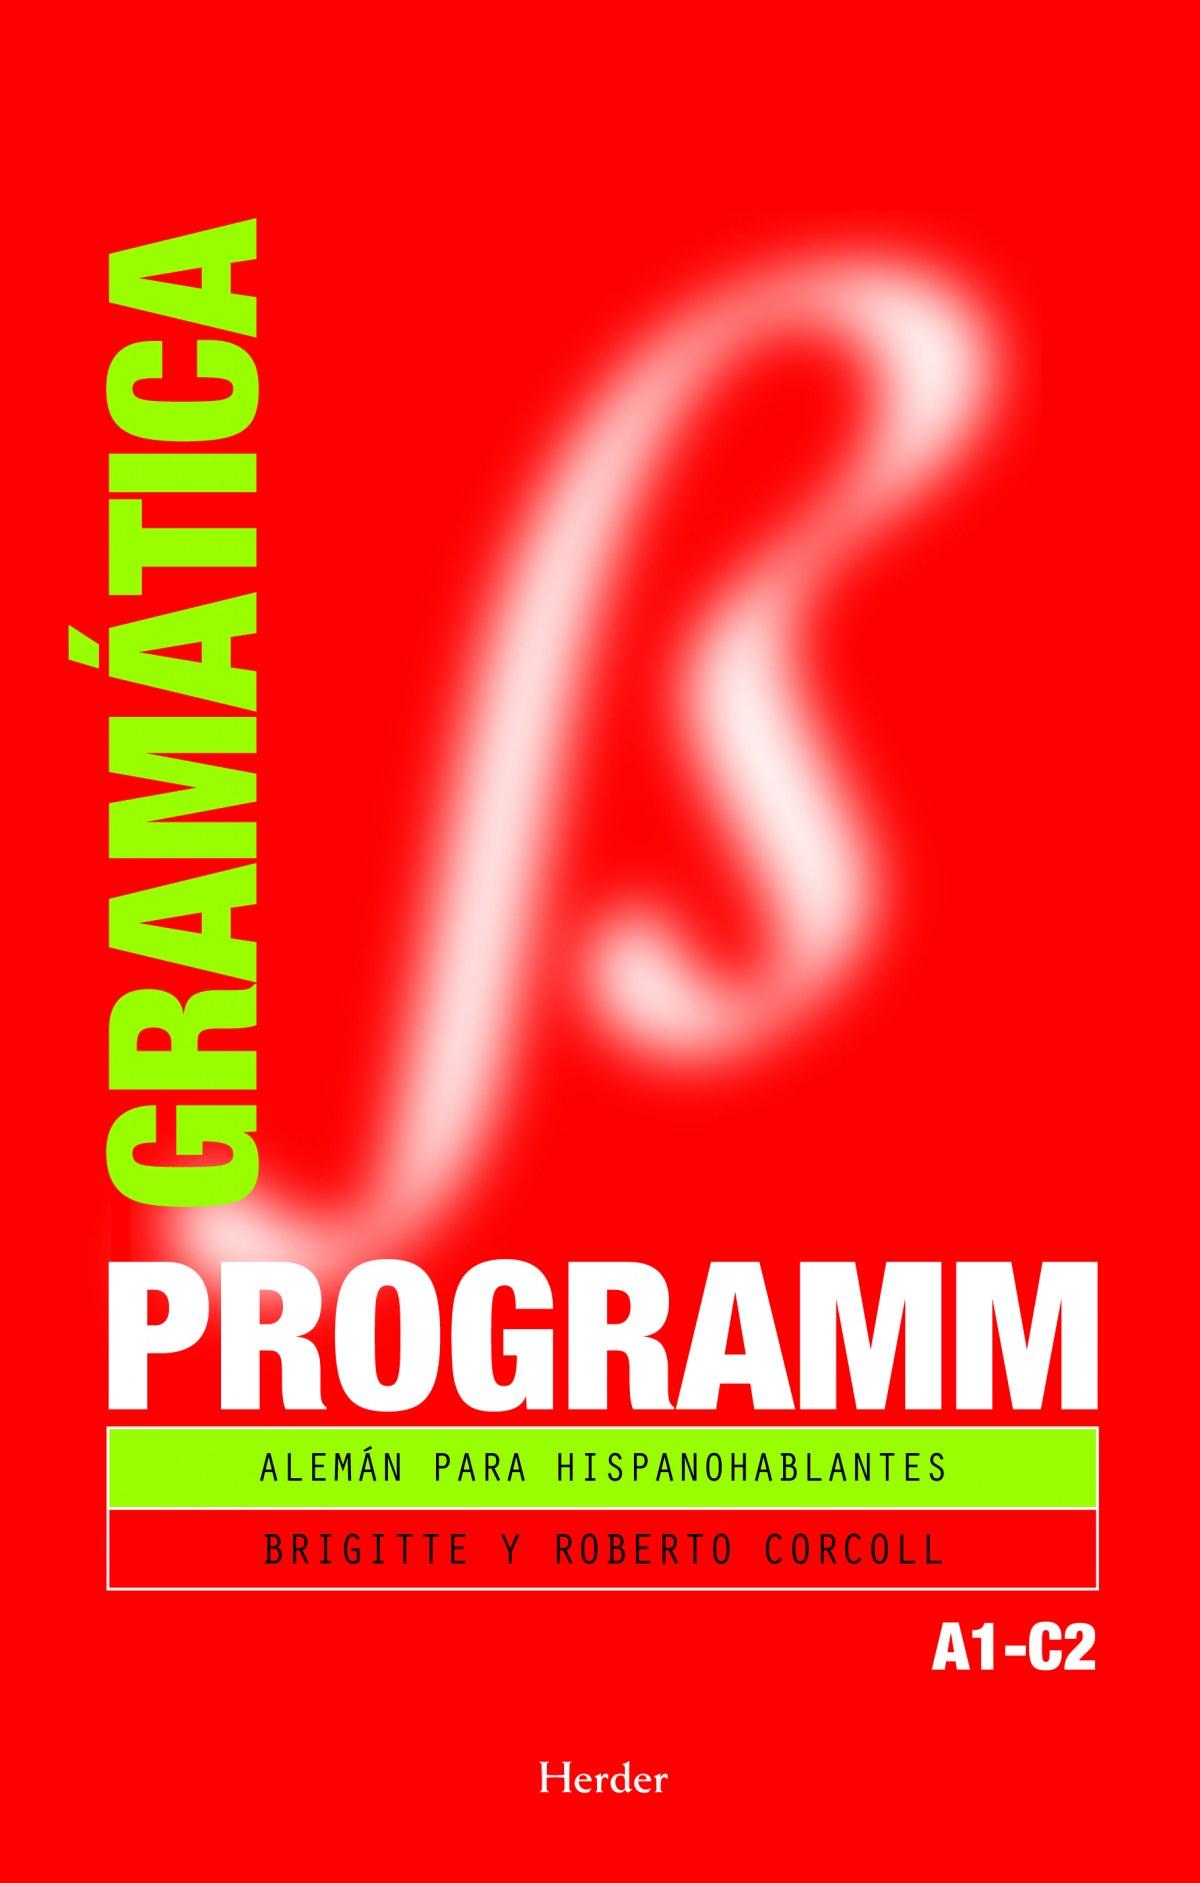 Gramatica aleman programm 9788425425011